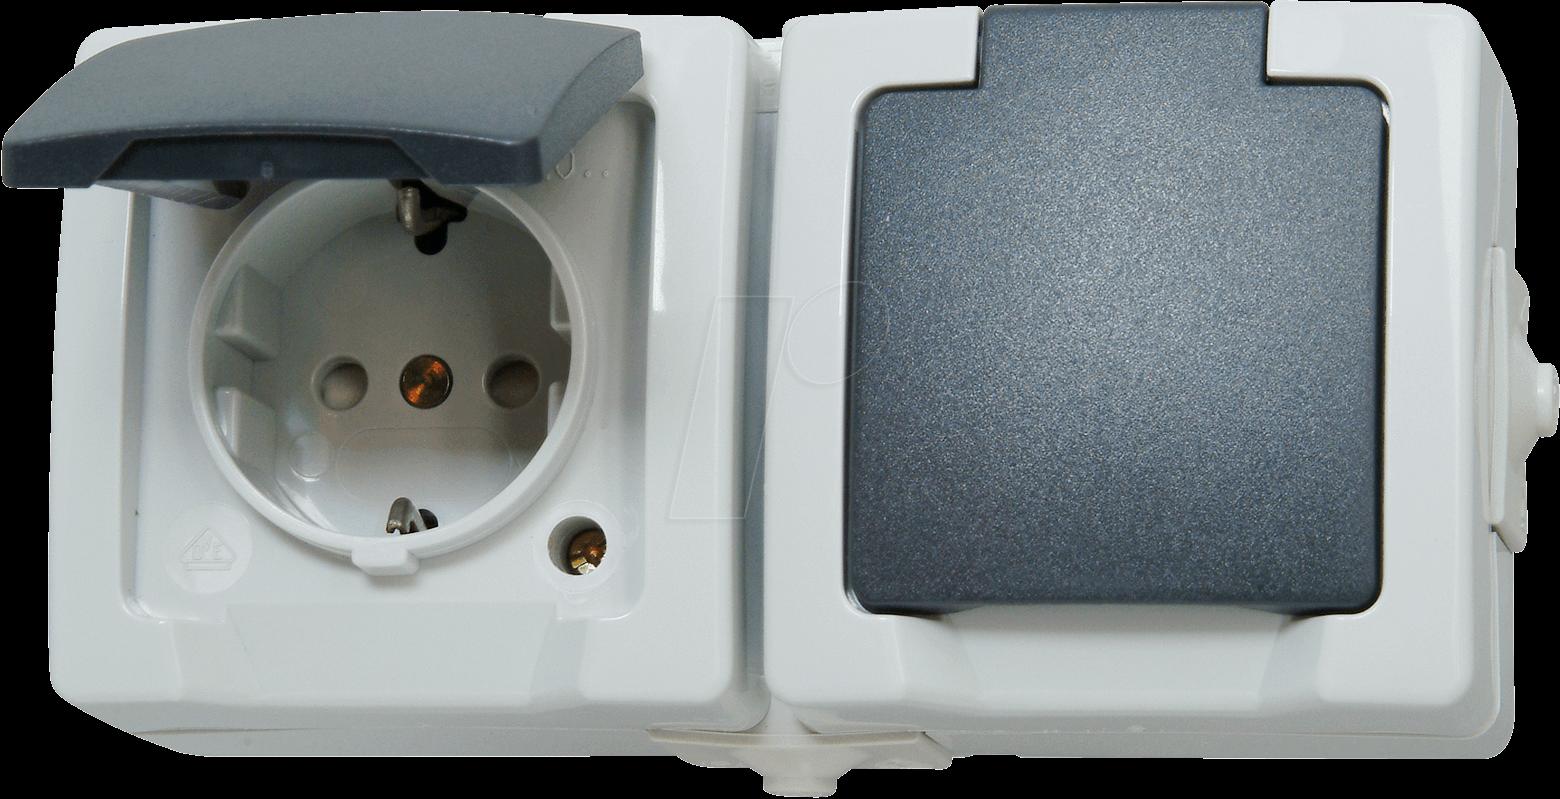 el frb skdo2w socket 50 x 75 x 150 mm 250 v 16 a 2p e avec obturateurs gris chez reichelt. Black Bedroom Furniture Sets. Home Design Ideas